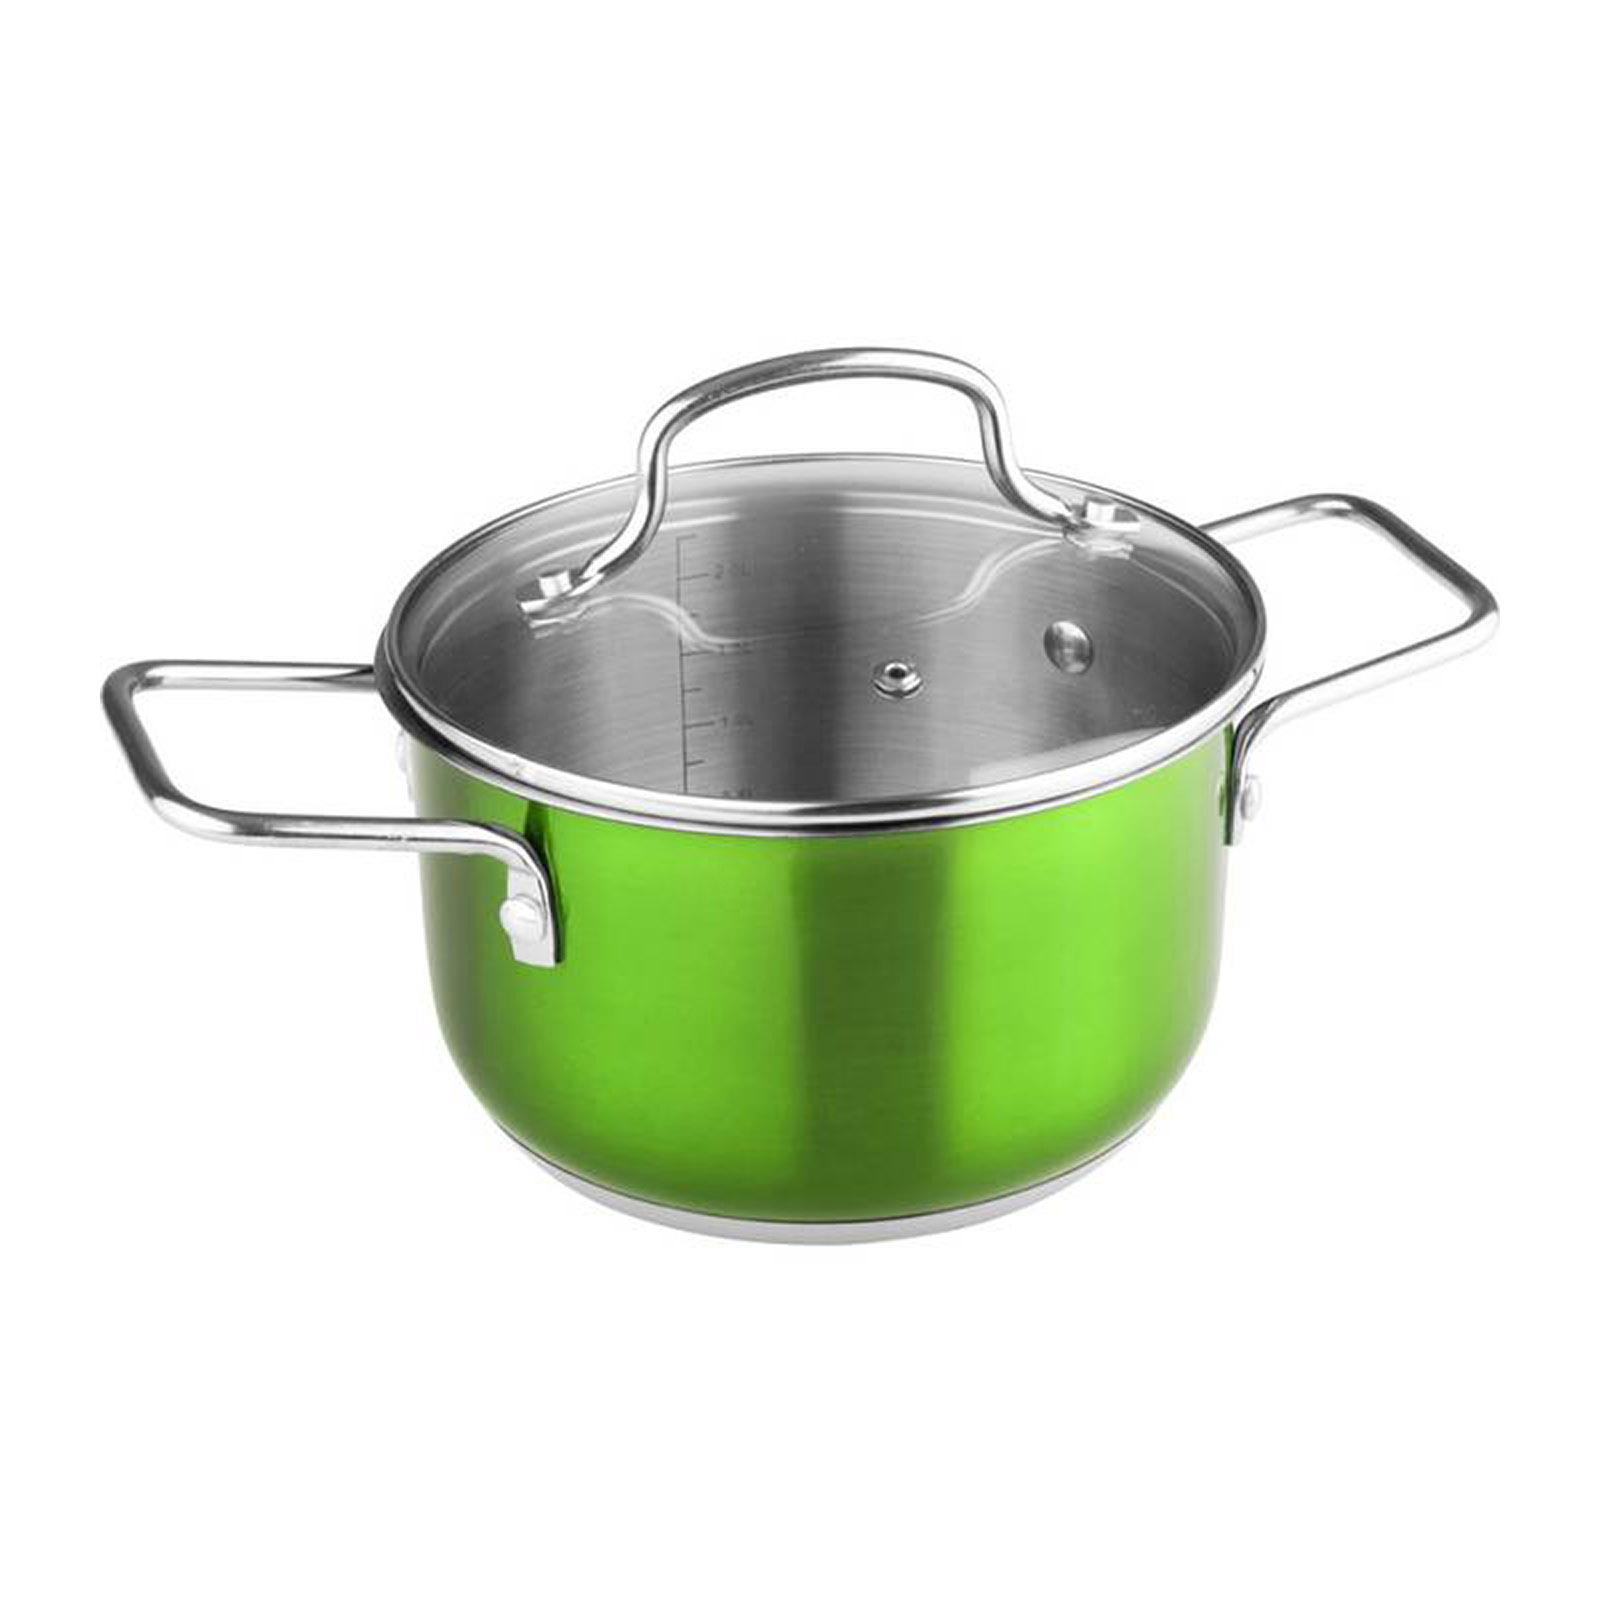 Lamart Joli Pot 18CM Green